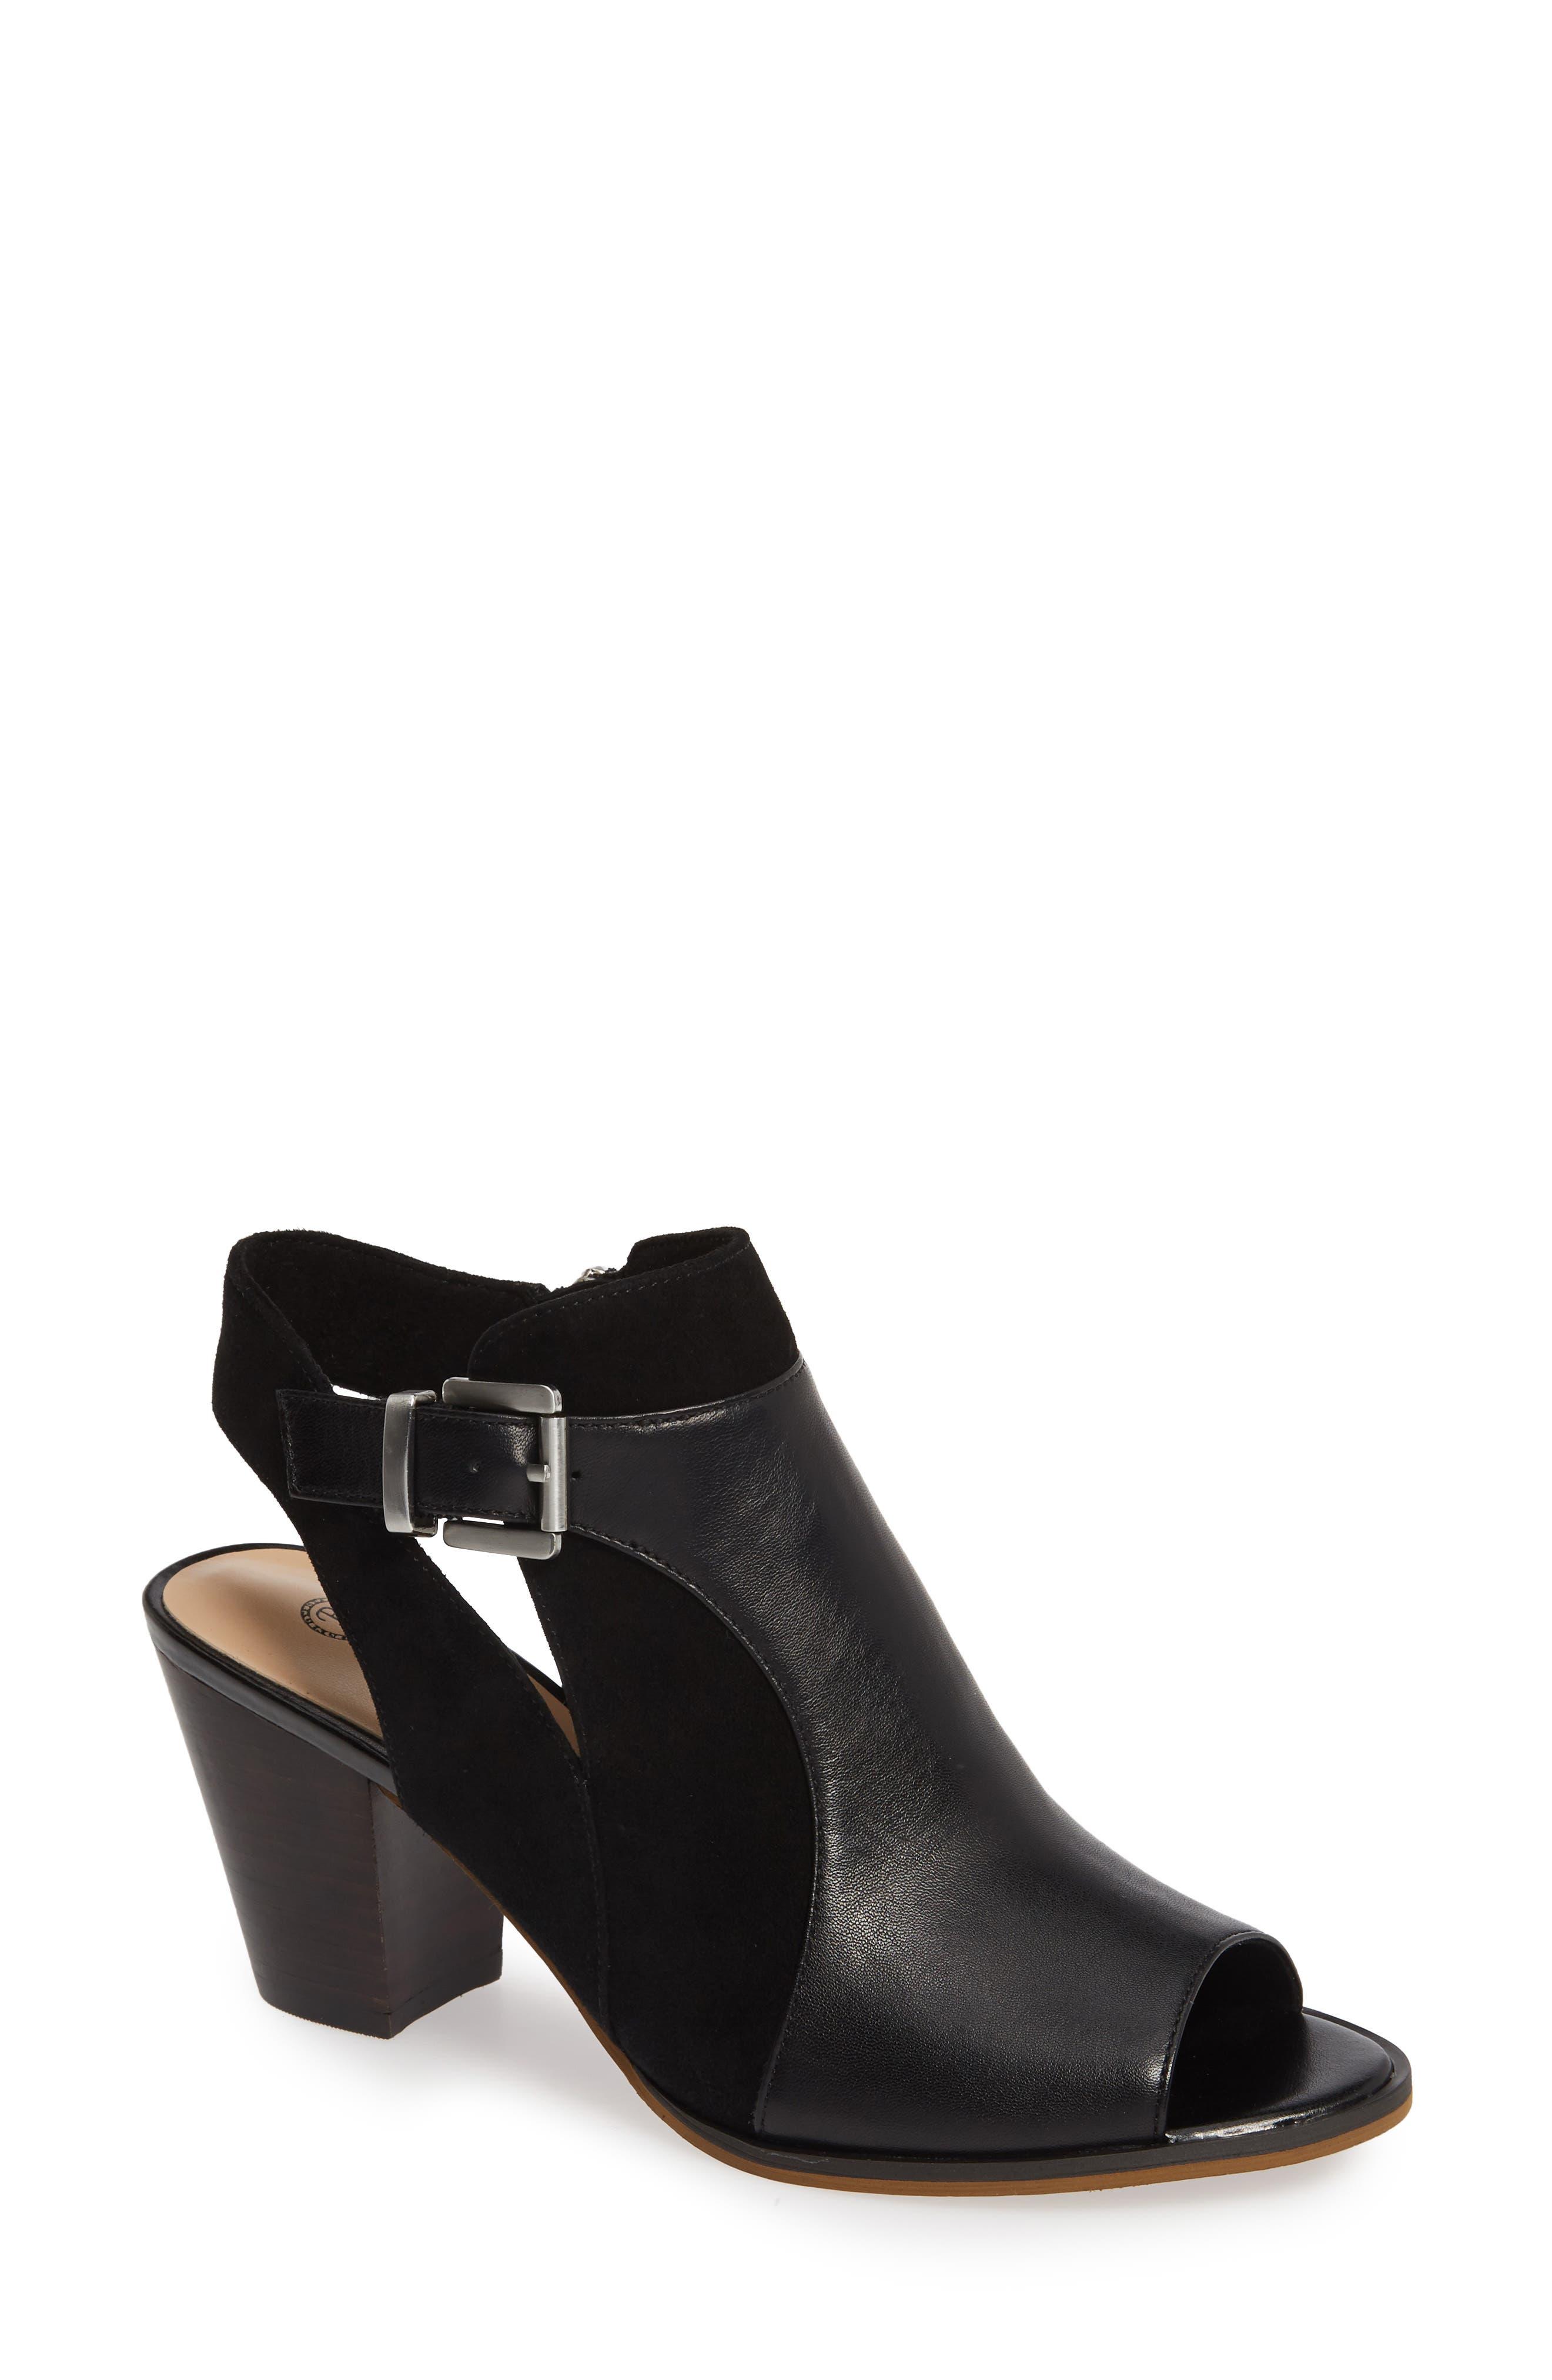 BELLA VITA Kellan Mixed Finish Sandal, Main, color, BLACK LEATHER/ SUEDE